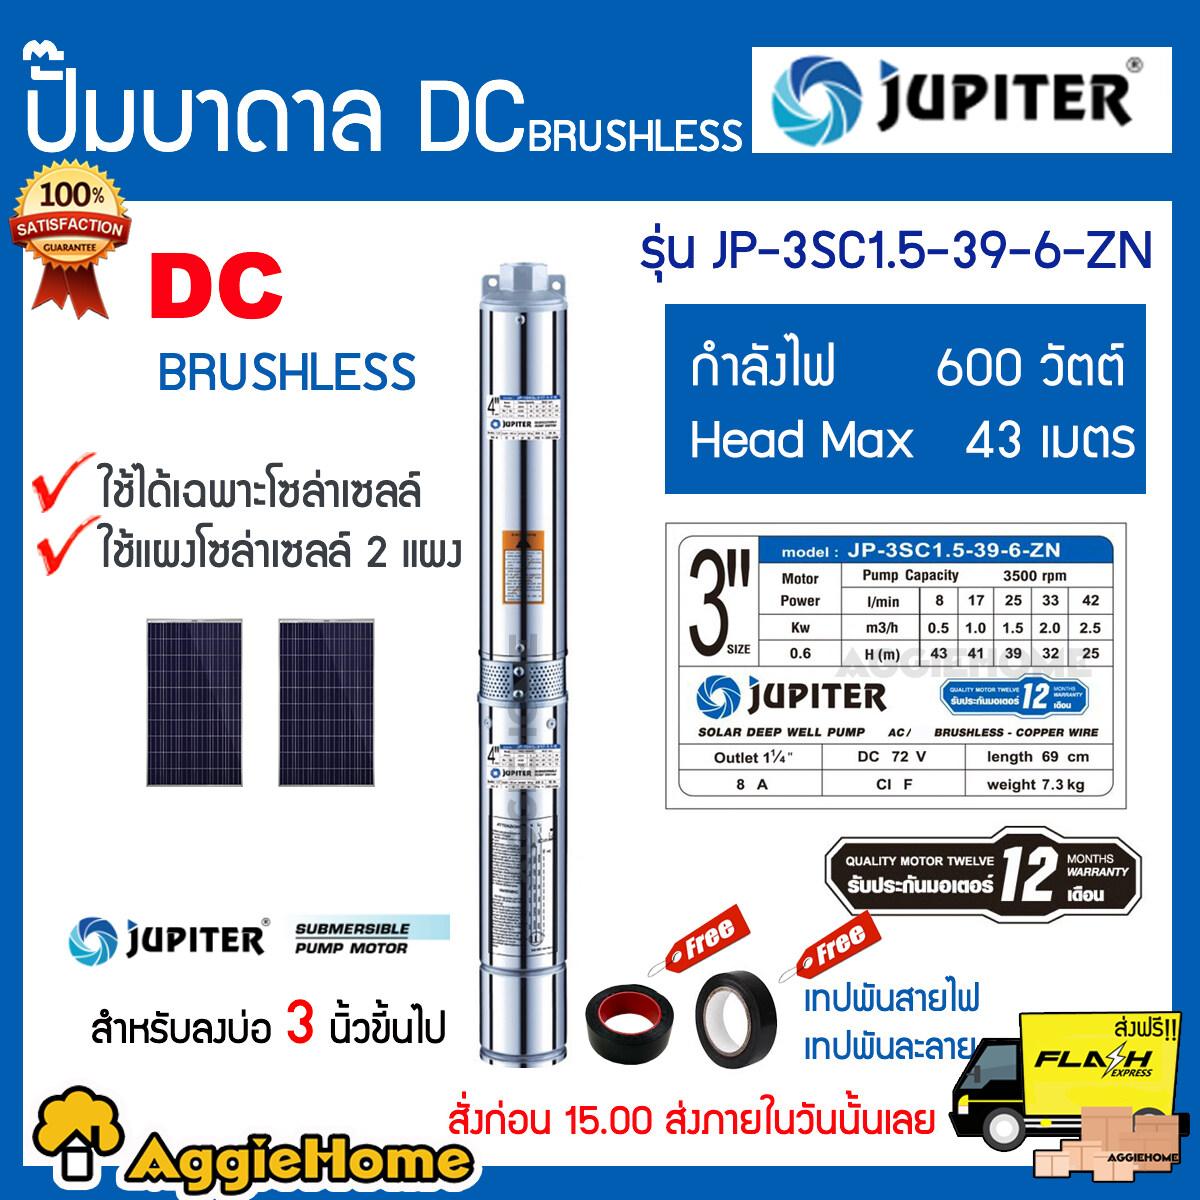 JUPITER ( ZN ) ปั๊มบาดาล DC รุ่นJP-3SC1.5-39-6-Z์N 600วัตต์ 11/4นิ้ว (นิ้วสอง) BRUSHLESS (ไม่มีกล่องคอนโทรล ไม่รวมแผง) โซล่าเซลล์ สำหรับลงบ่อ 3นิ้วขึ้นไป ฟรีเทปพันละลาย เทปพันลายไฟ ซัมเมิส บาดาล จัดส่งฟรีKERRY